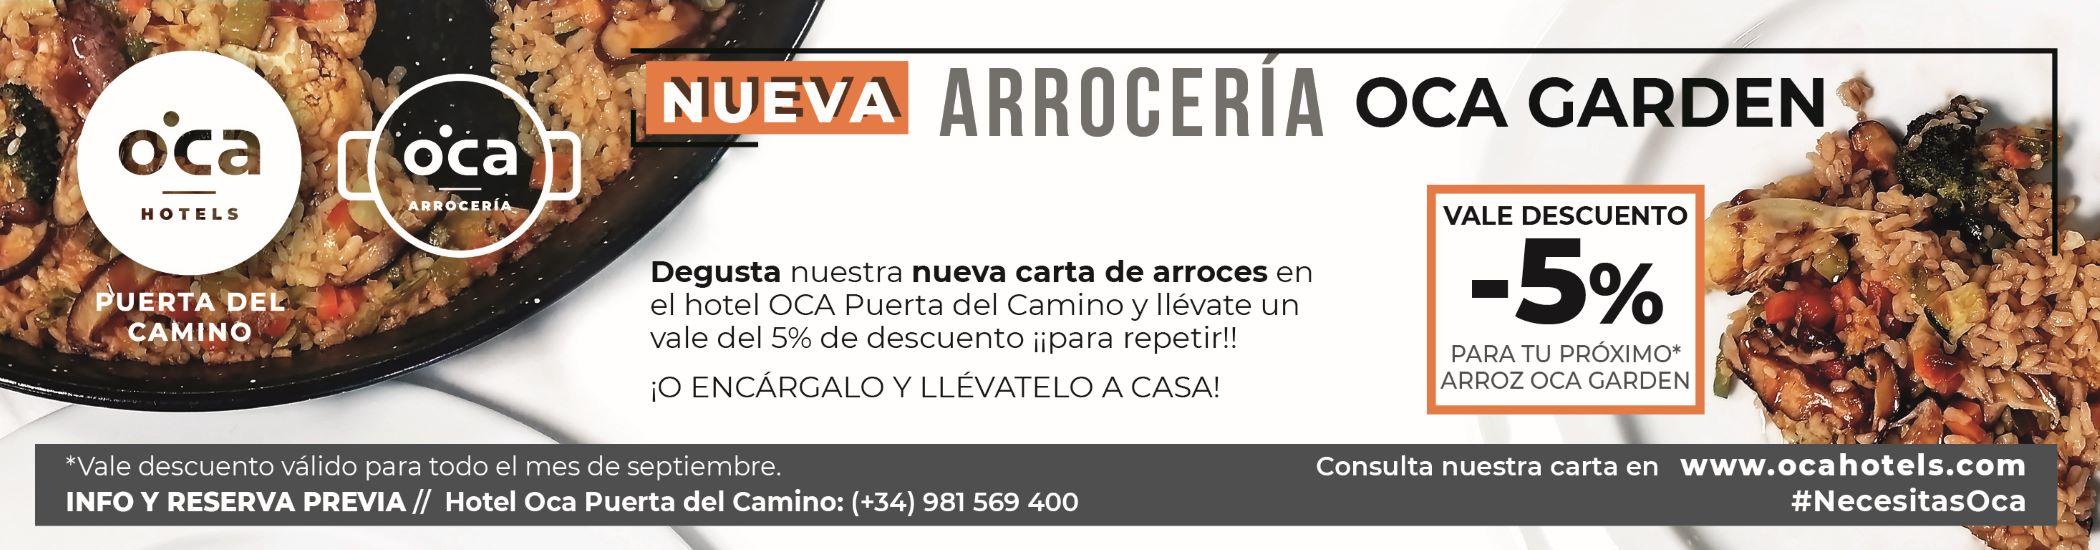 Imagen: https://images.neobookings.com/cms/ocahotels.com/section/restaurants-of-hotel-oca-puerta-del-camino/pics/restaurants-of-hotel-oca-puerta-del-camino-zme4122egp.jpeg